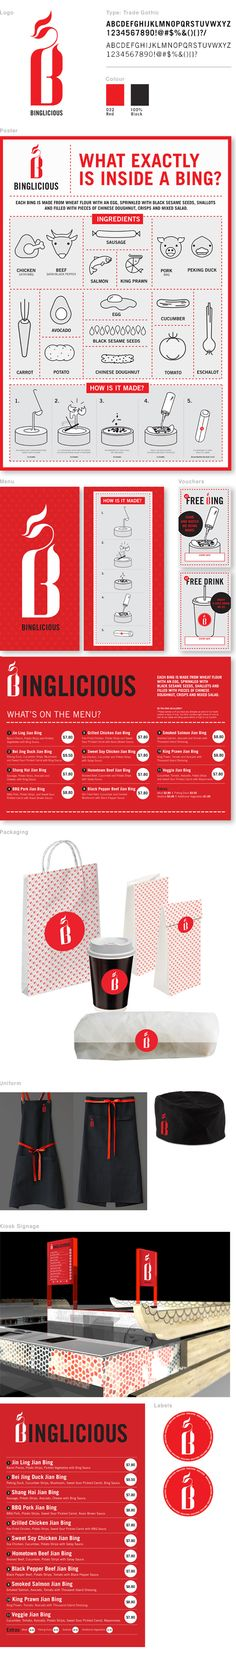 designed by joe scerri Food Design, Branding, Graphic Design, Brand Management, Corporate Identity